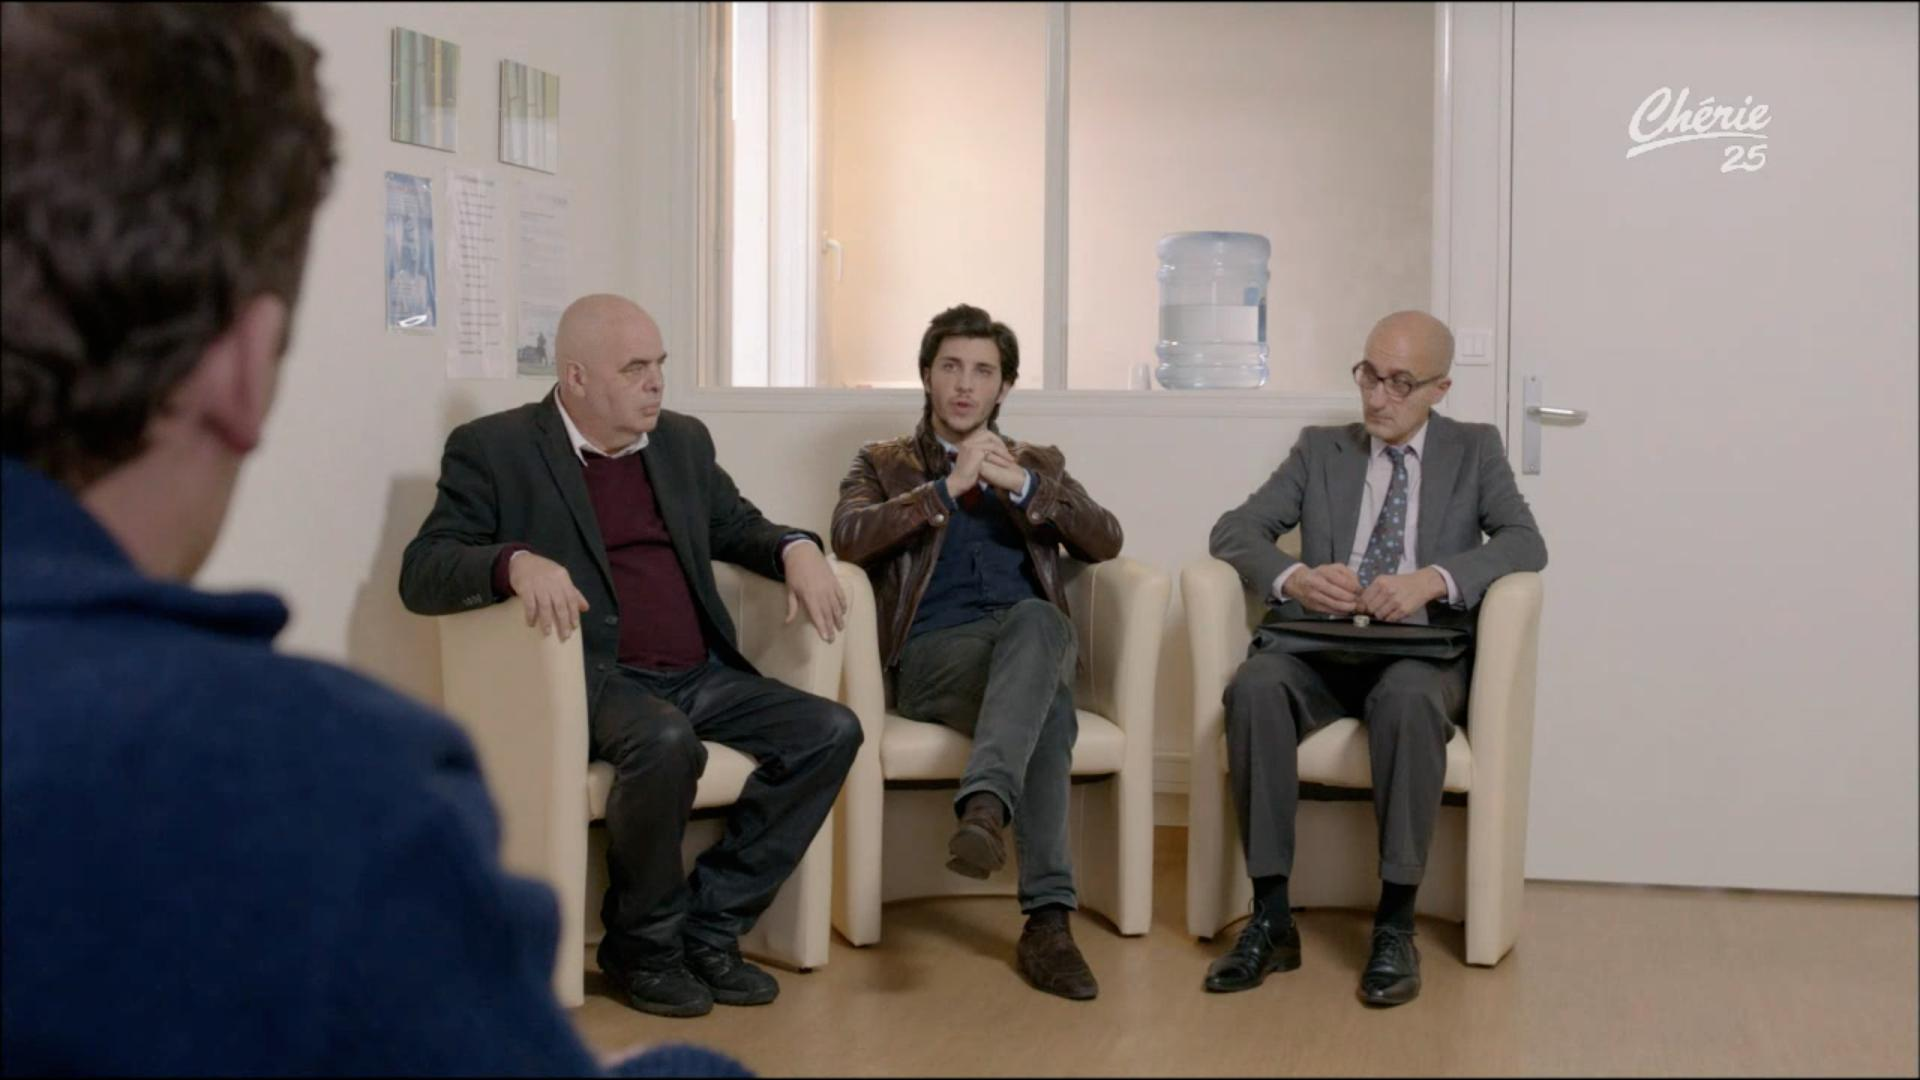 Maxence Kouzoubachian in Un si joli mensonge (2014)